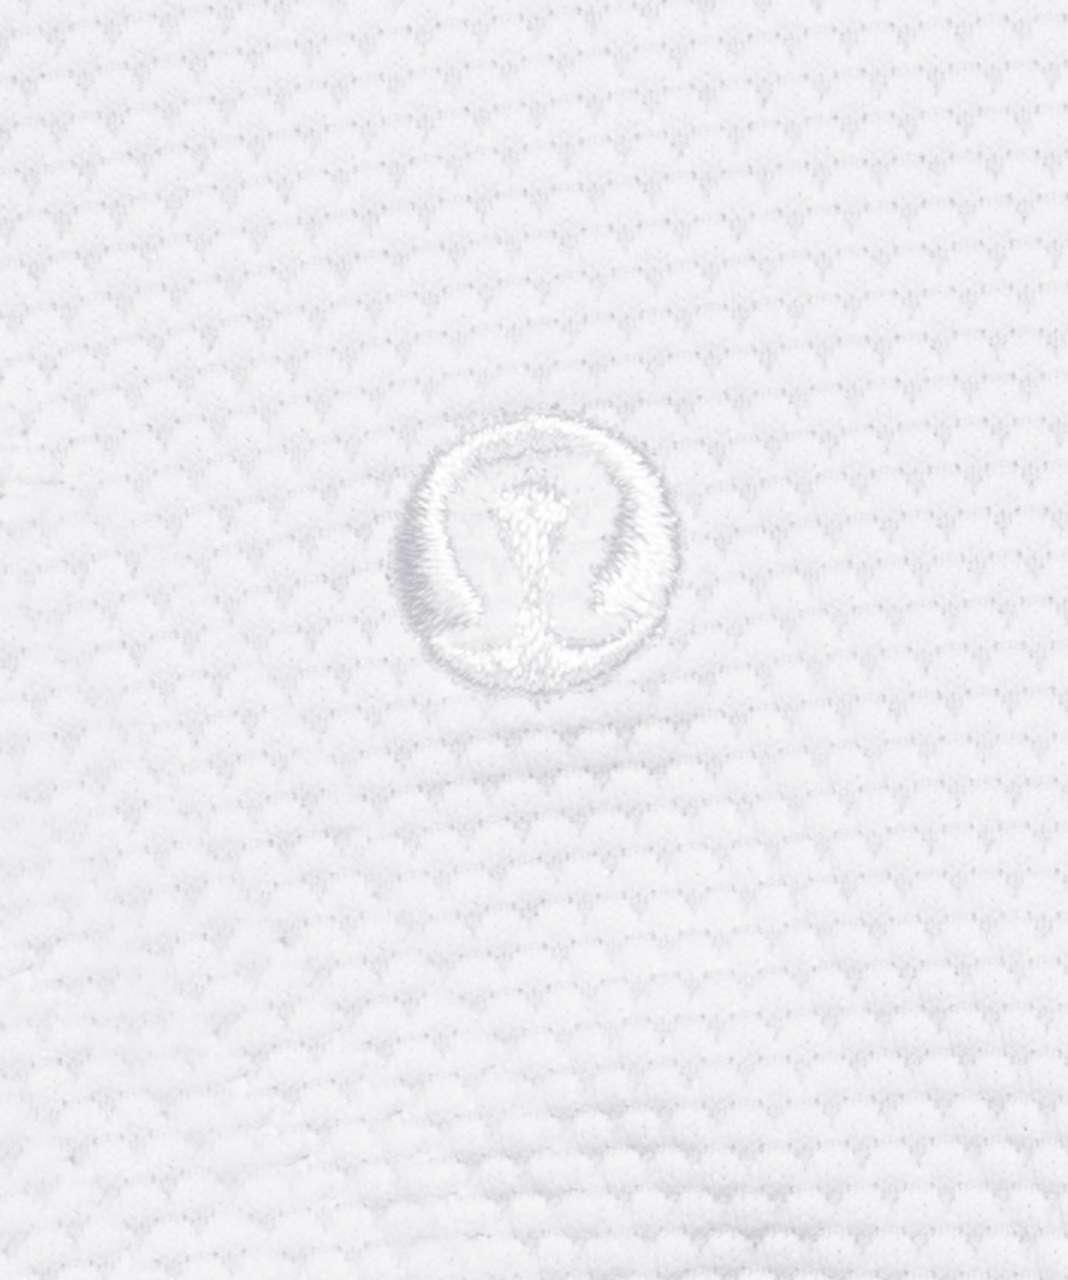 Lululemon Honeycomb Dip Square Swim Top *A/B Cups - White